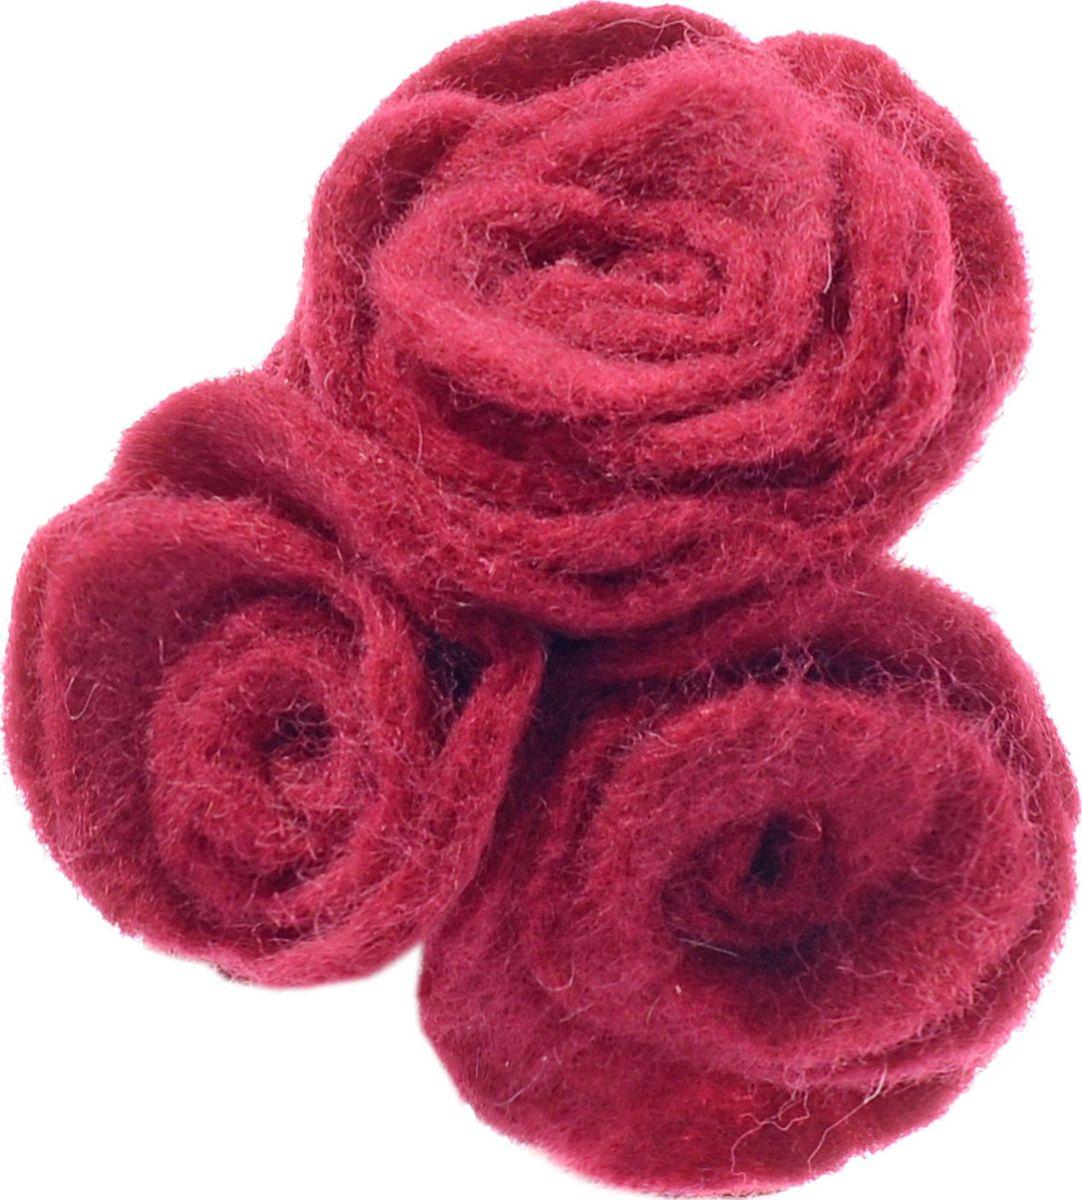 Резинка для волос Malina By Андерсен Шарли, цвет: бордовый. 31704рб5431704рб54